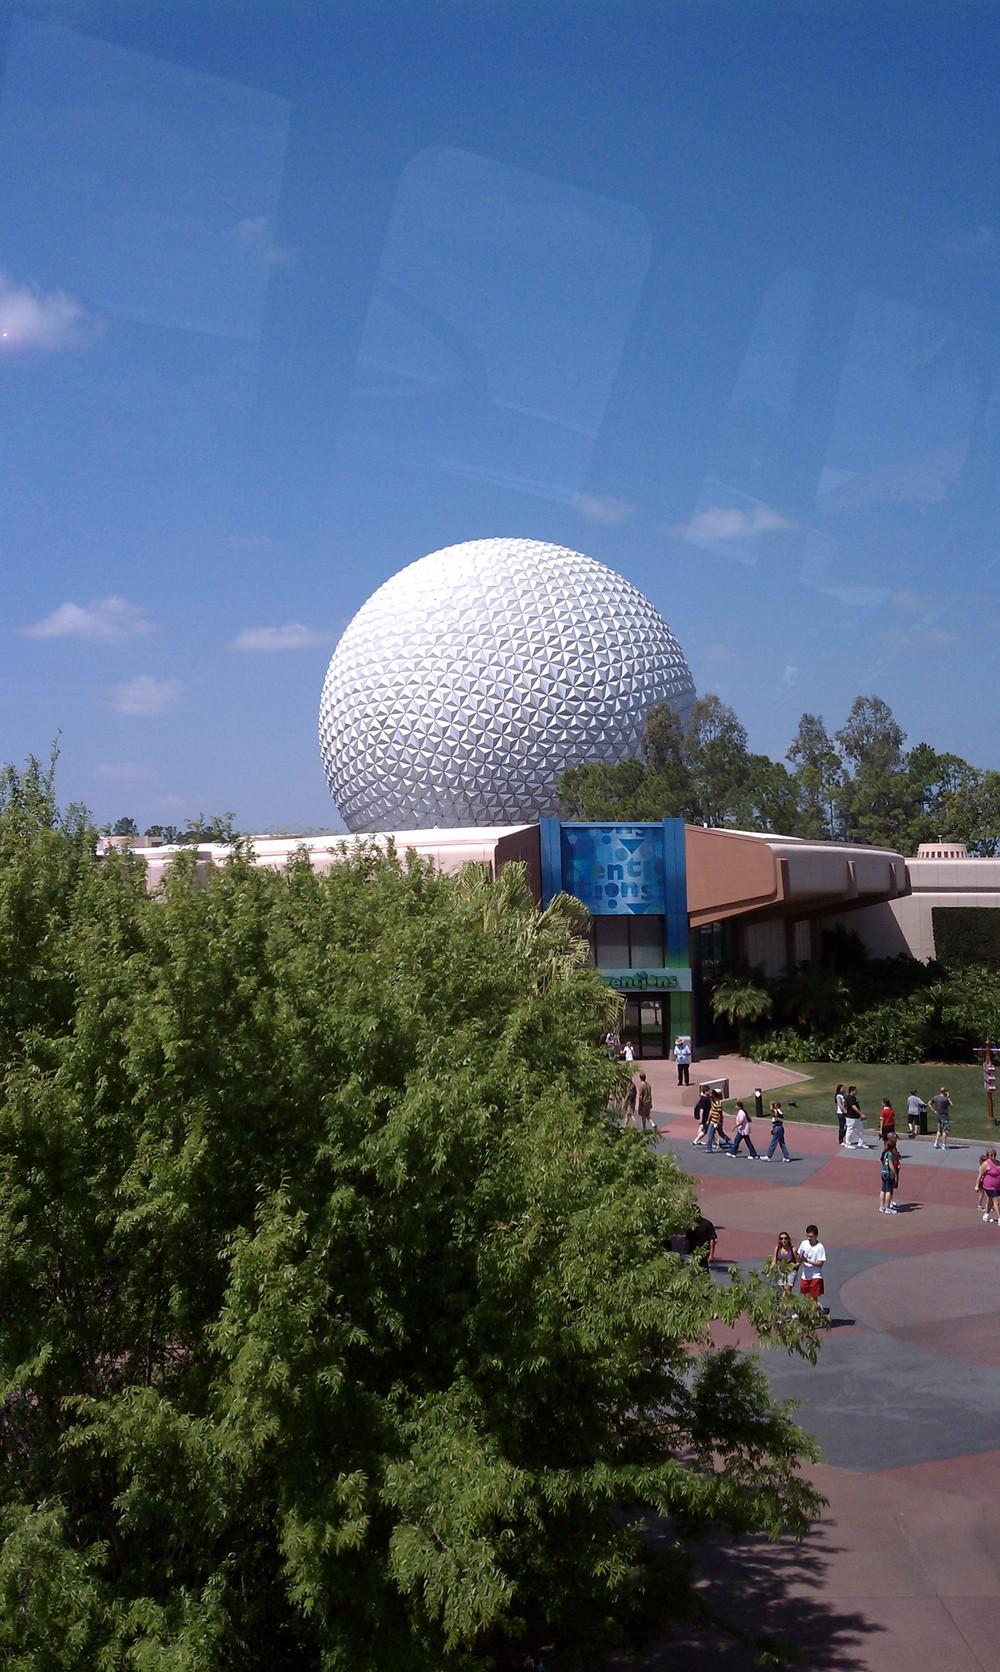 Epcot's Geodesic Sphere 8